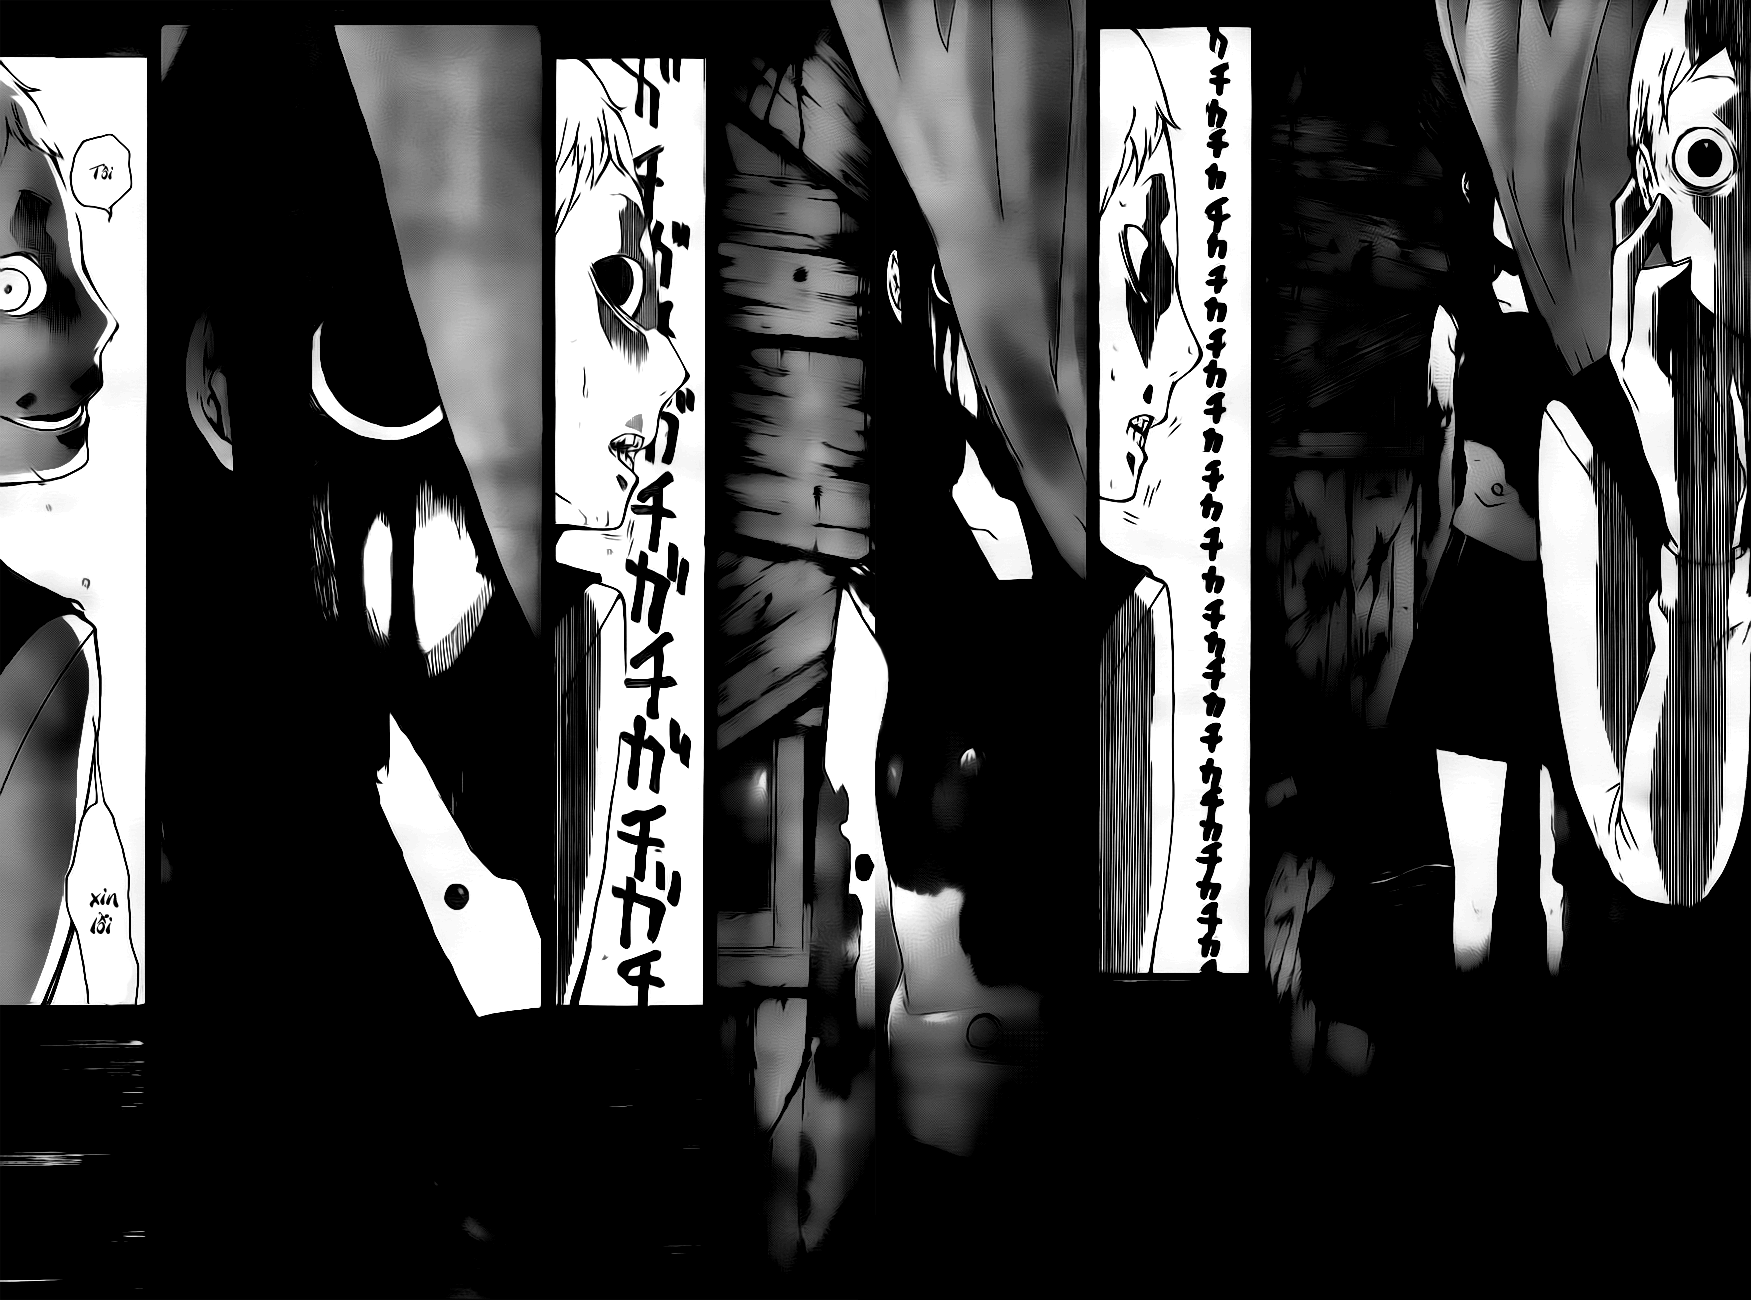 Kiben Gakuha, Yotsuya Senpai no Kaidan chap 3 Trang 14 - Mangak.info